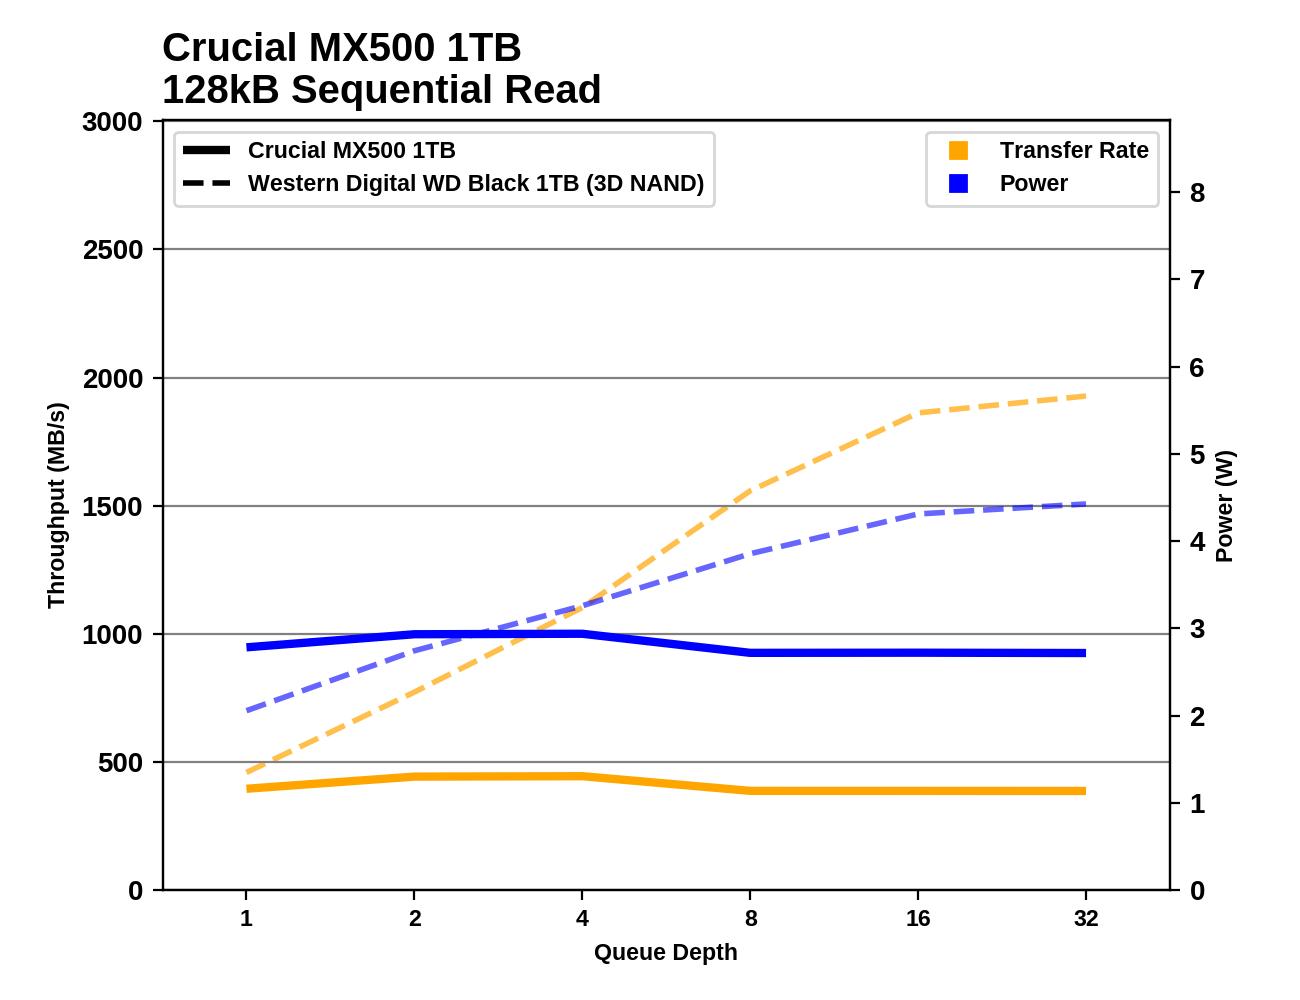 Обзор Western Digital WD Black 3D NAND SSD: EVO встретил равного - 88